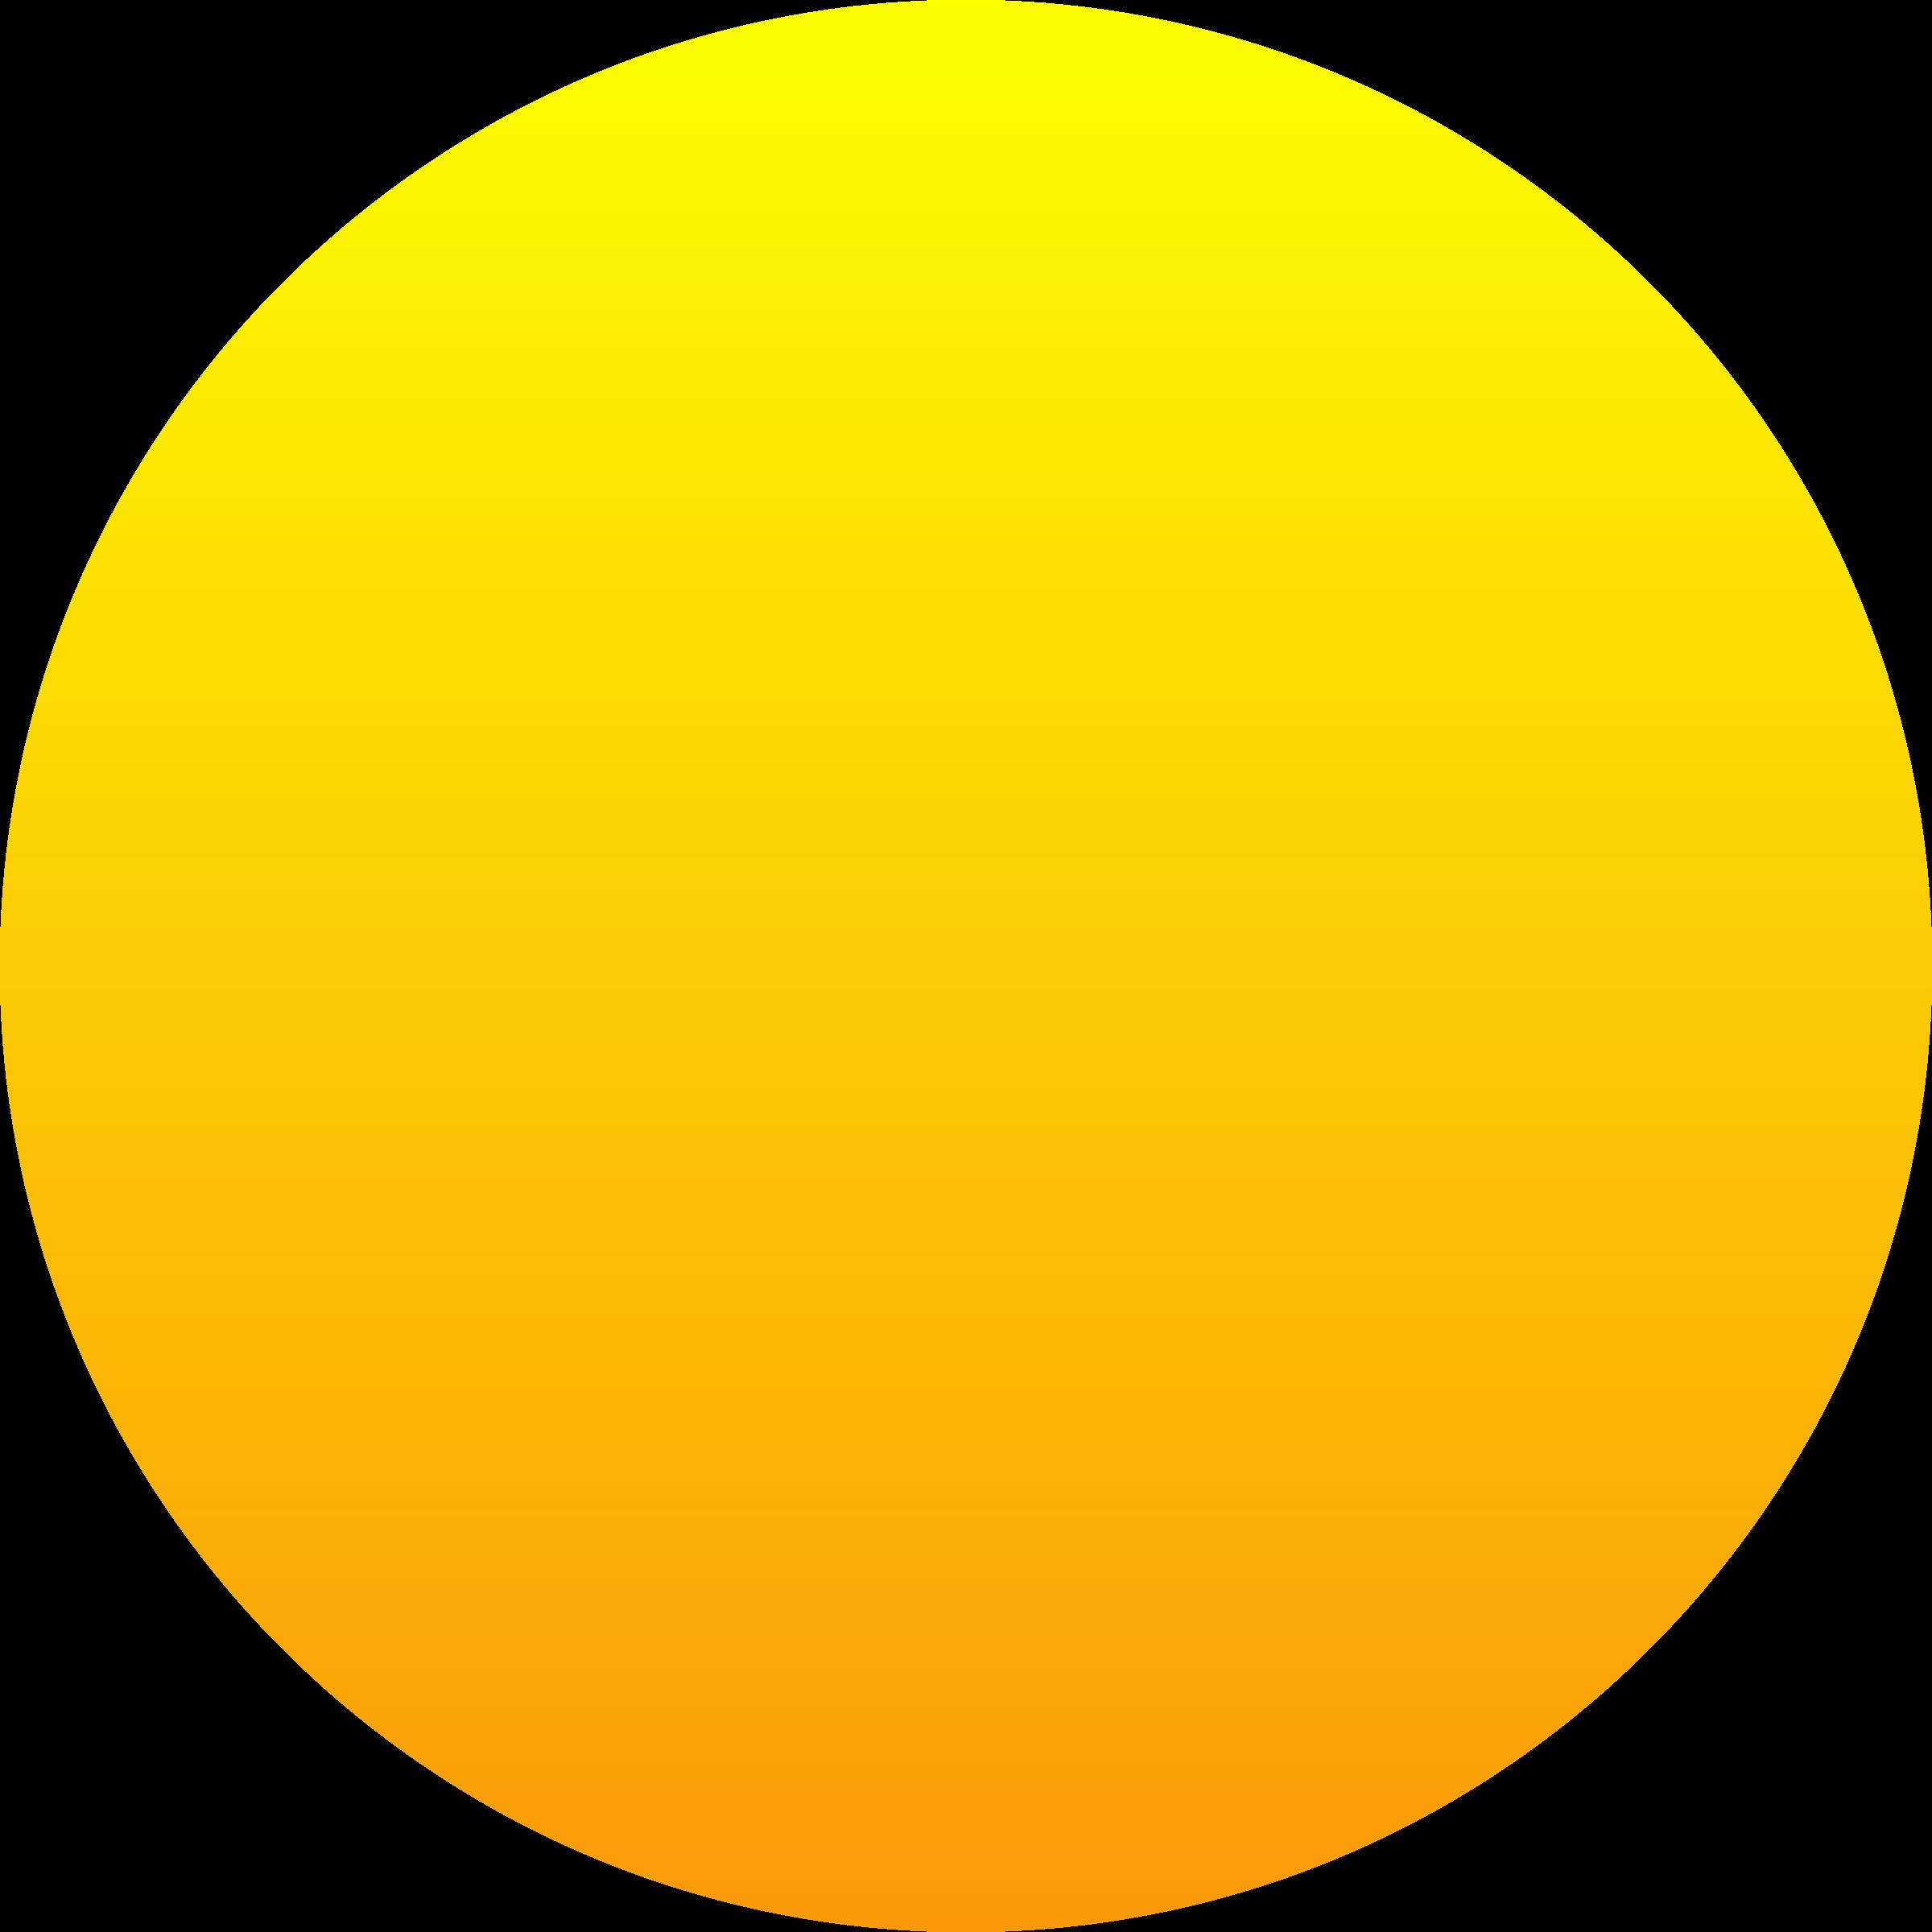 Sun clip art nature 3